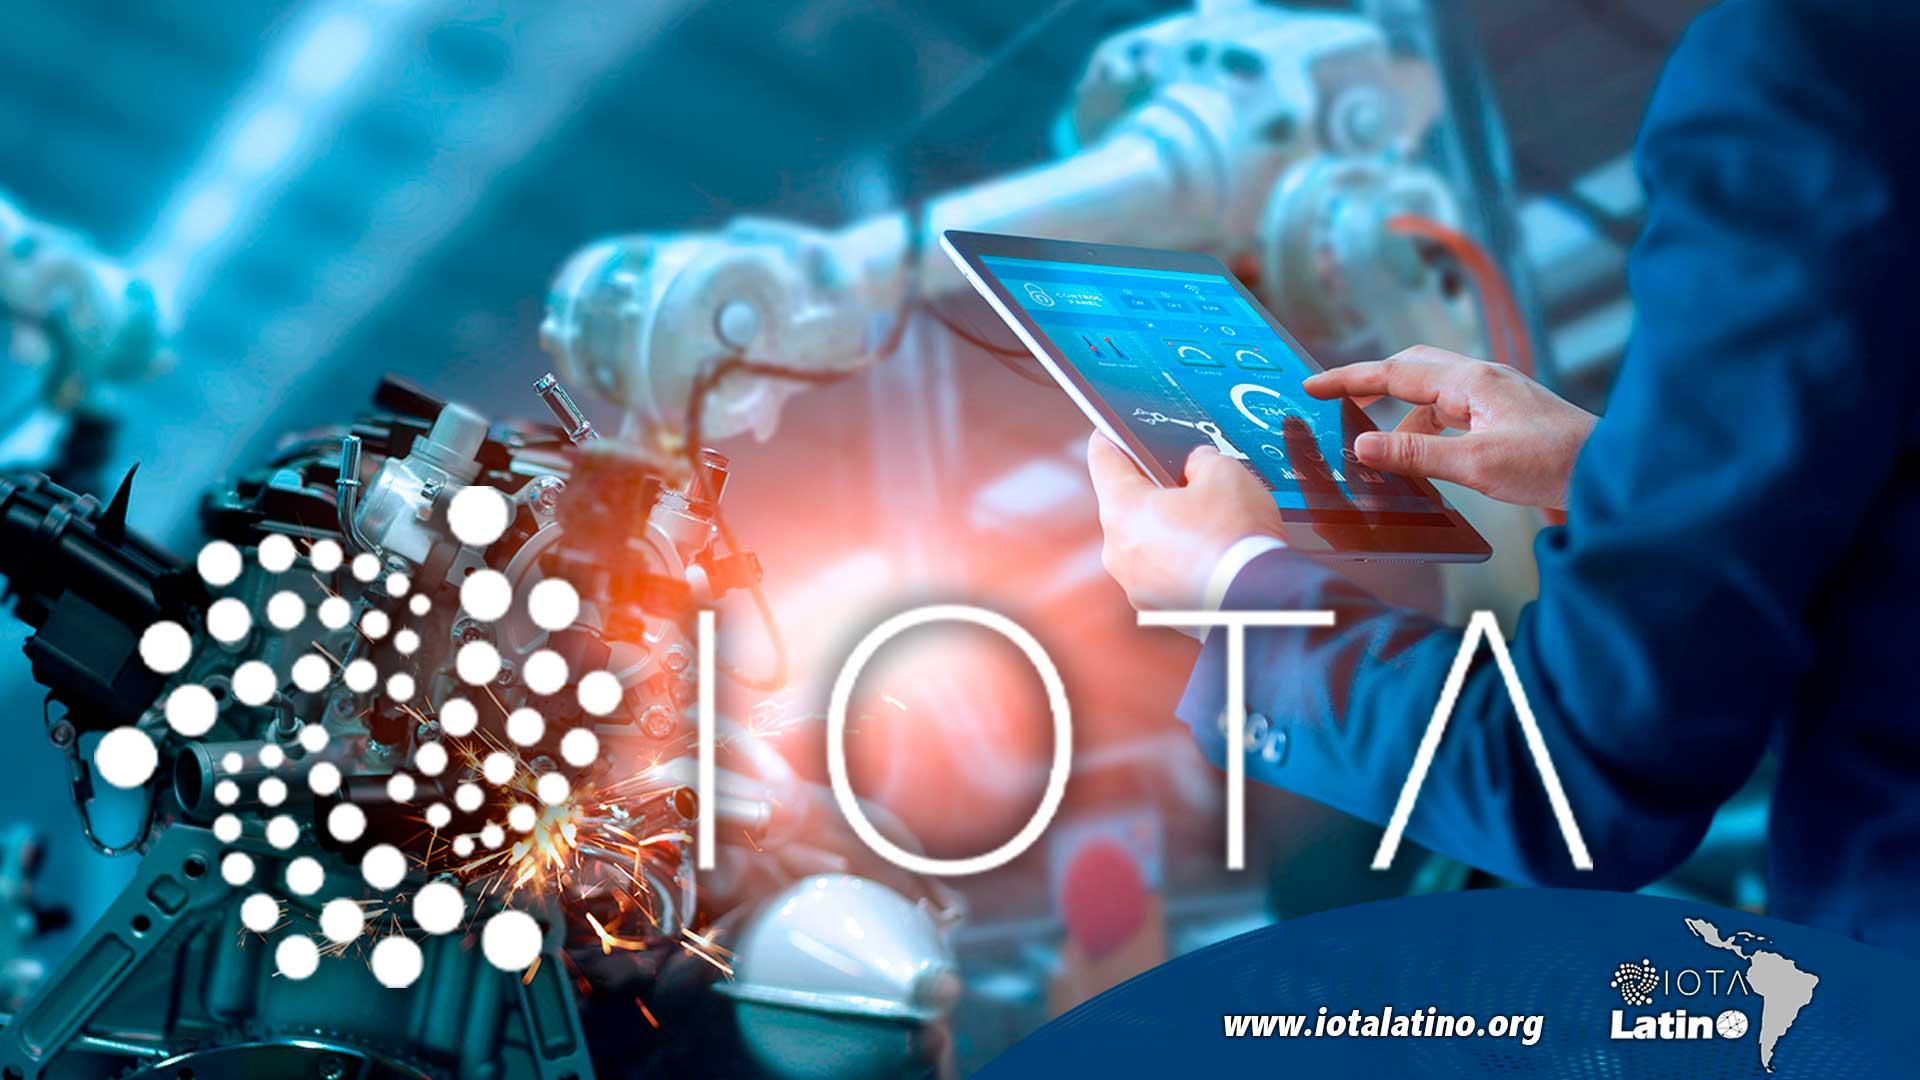 Industria 4.0 apuesta a IOTA - IOTA Latino